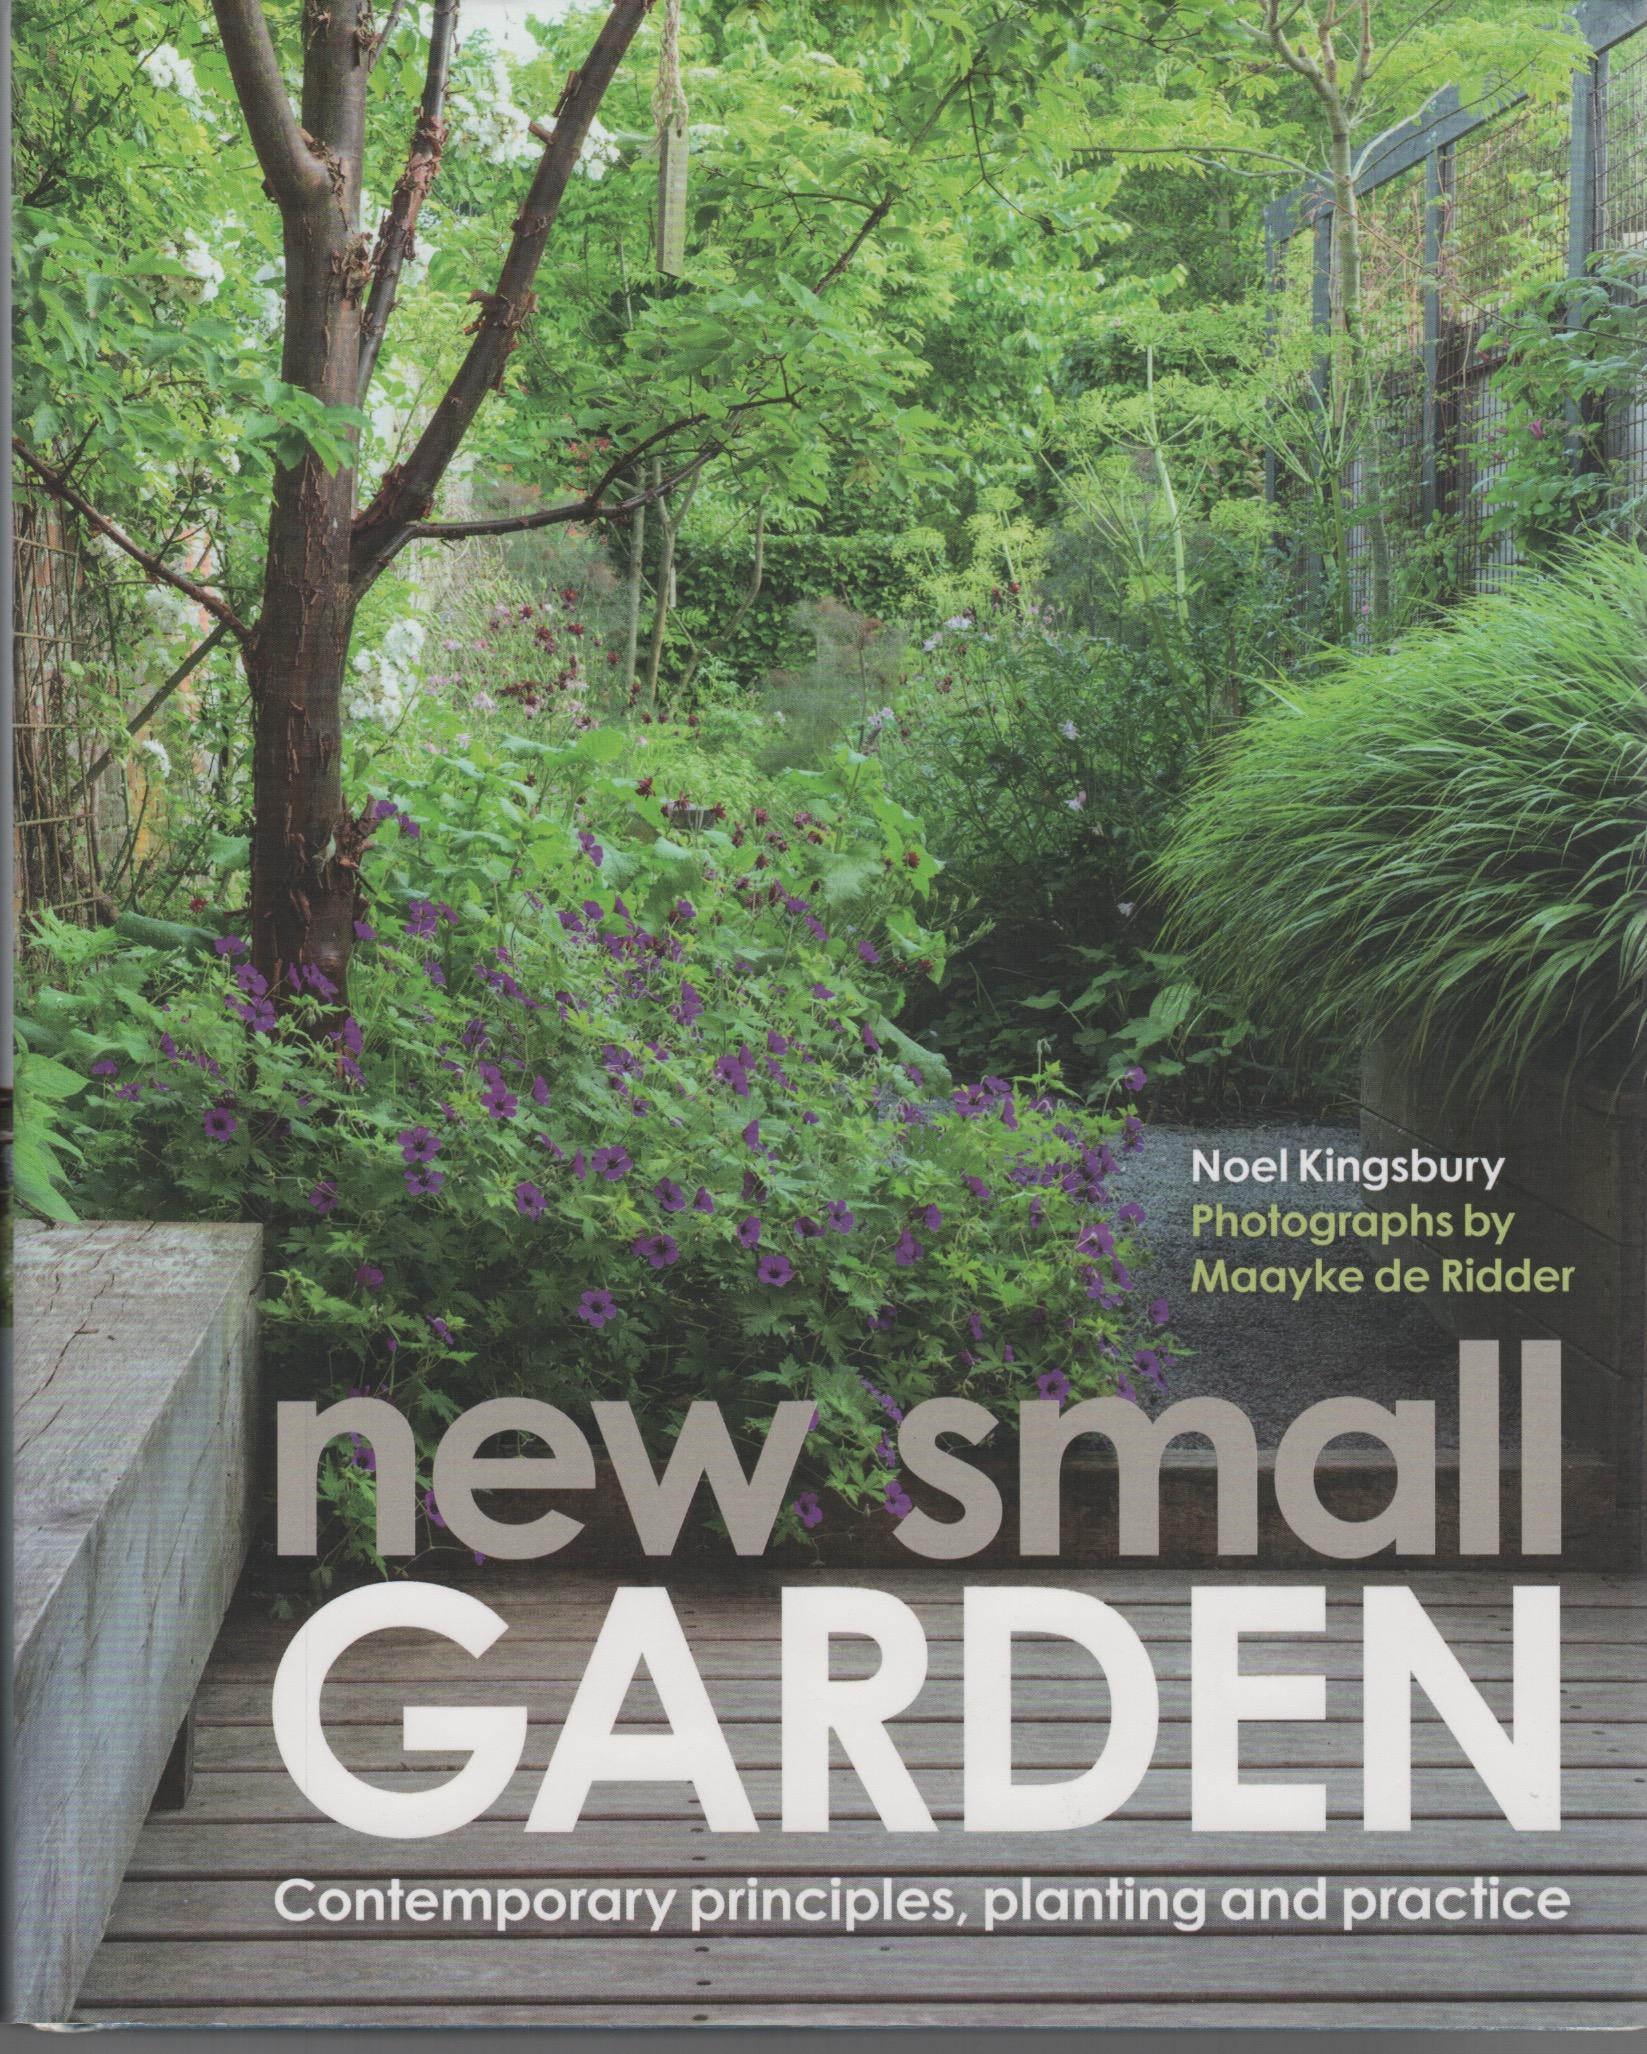 New Small Garden, Noel Kingsbury, 2016